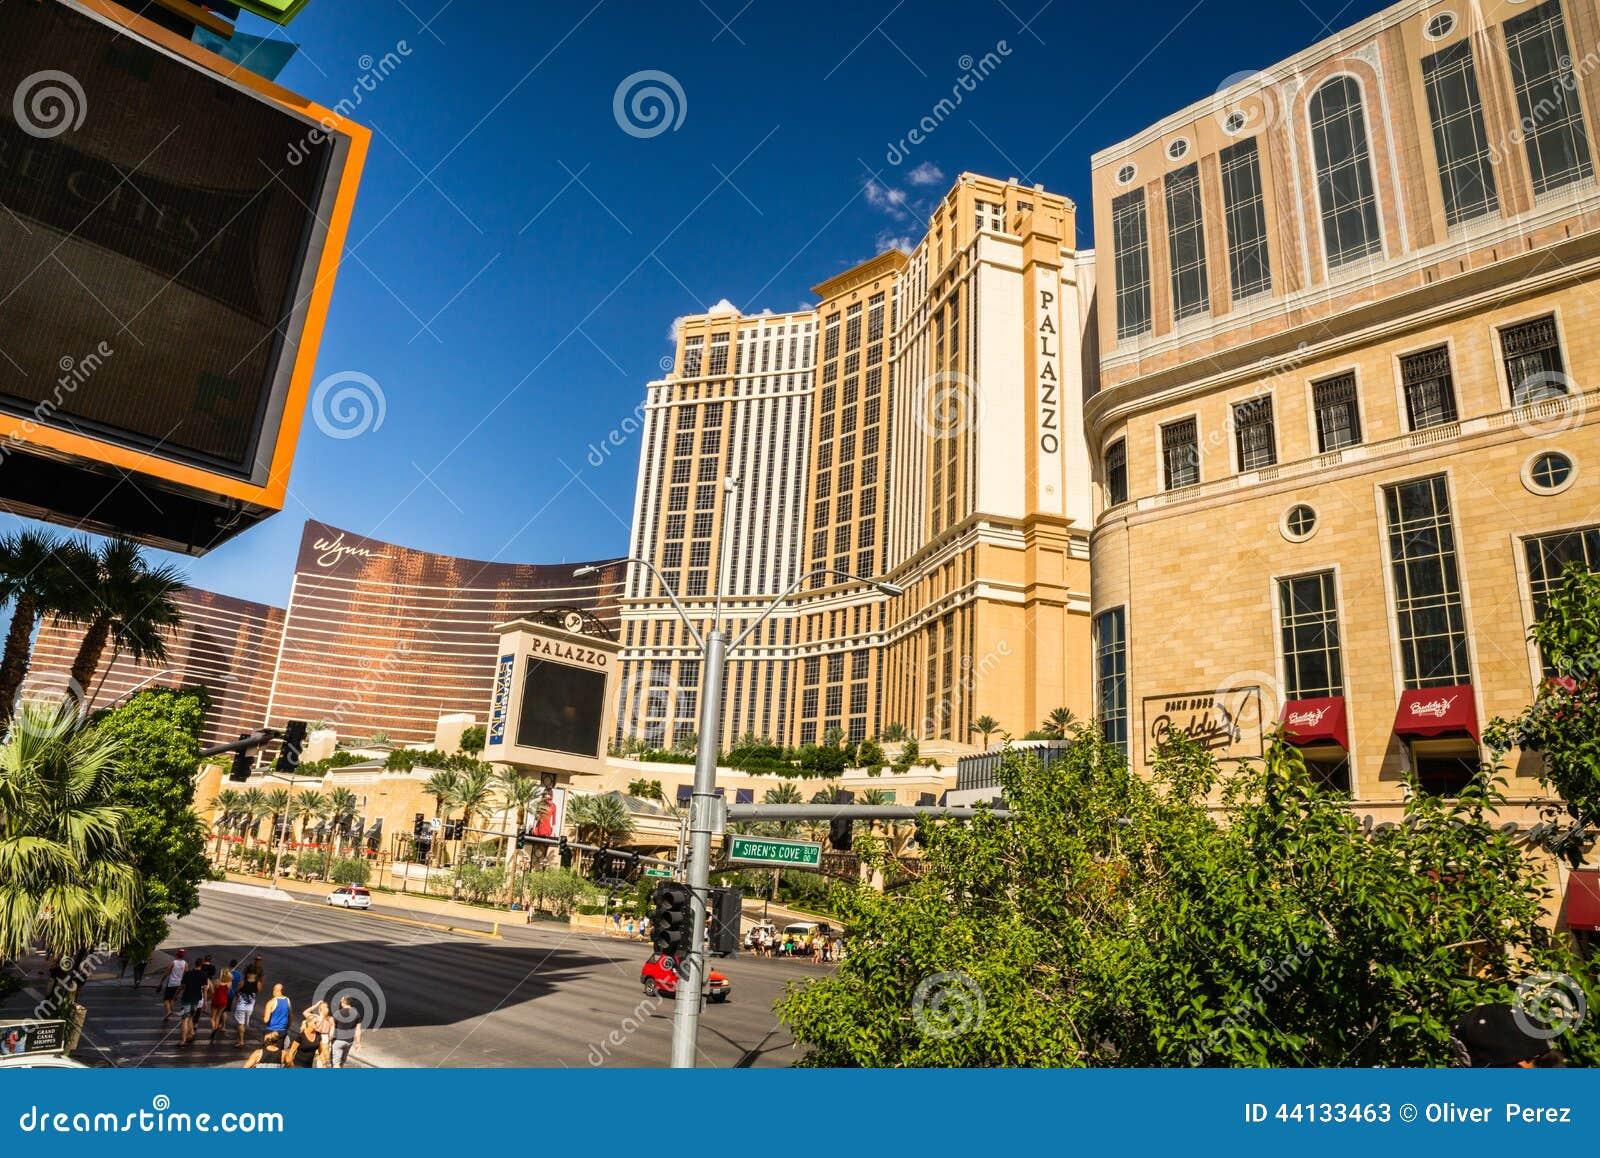 wyandotte casino ks